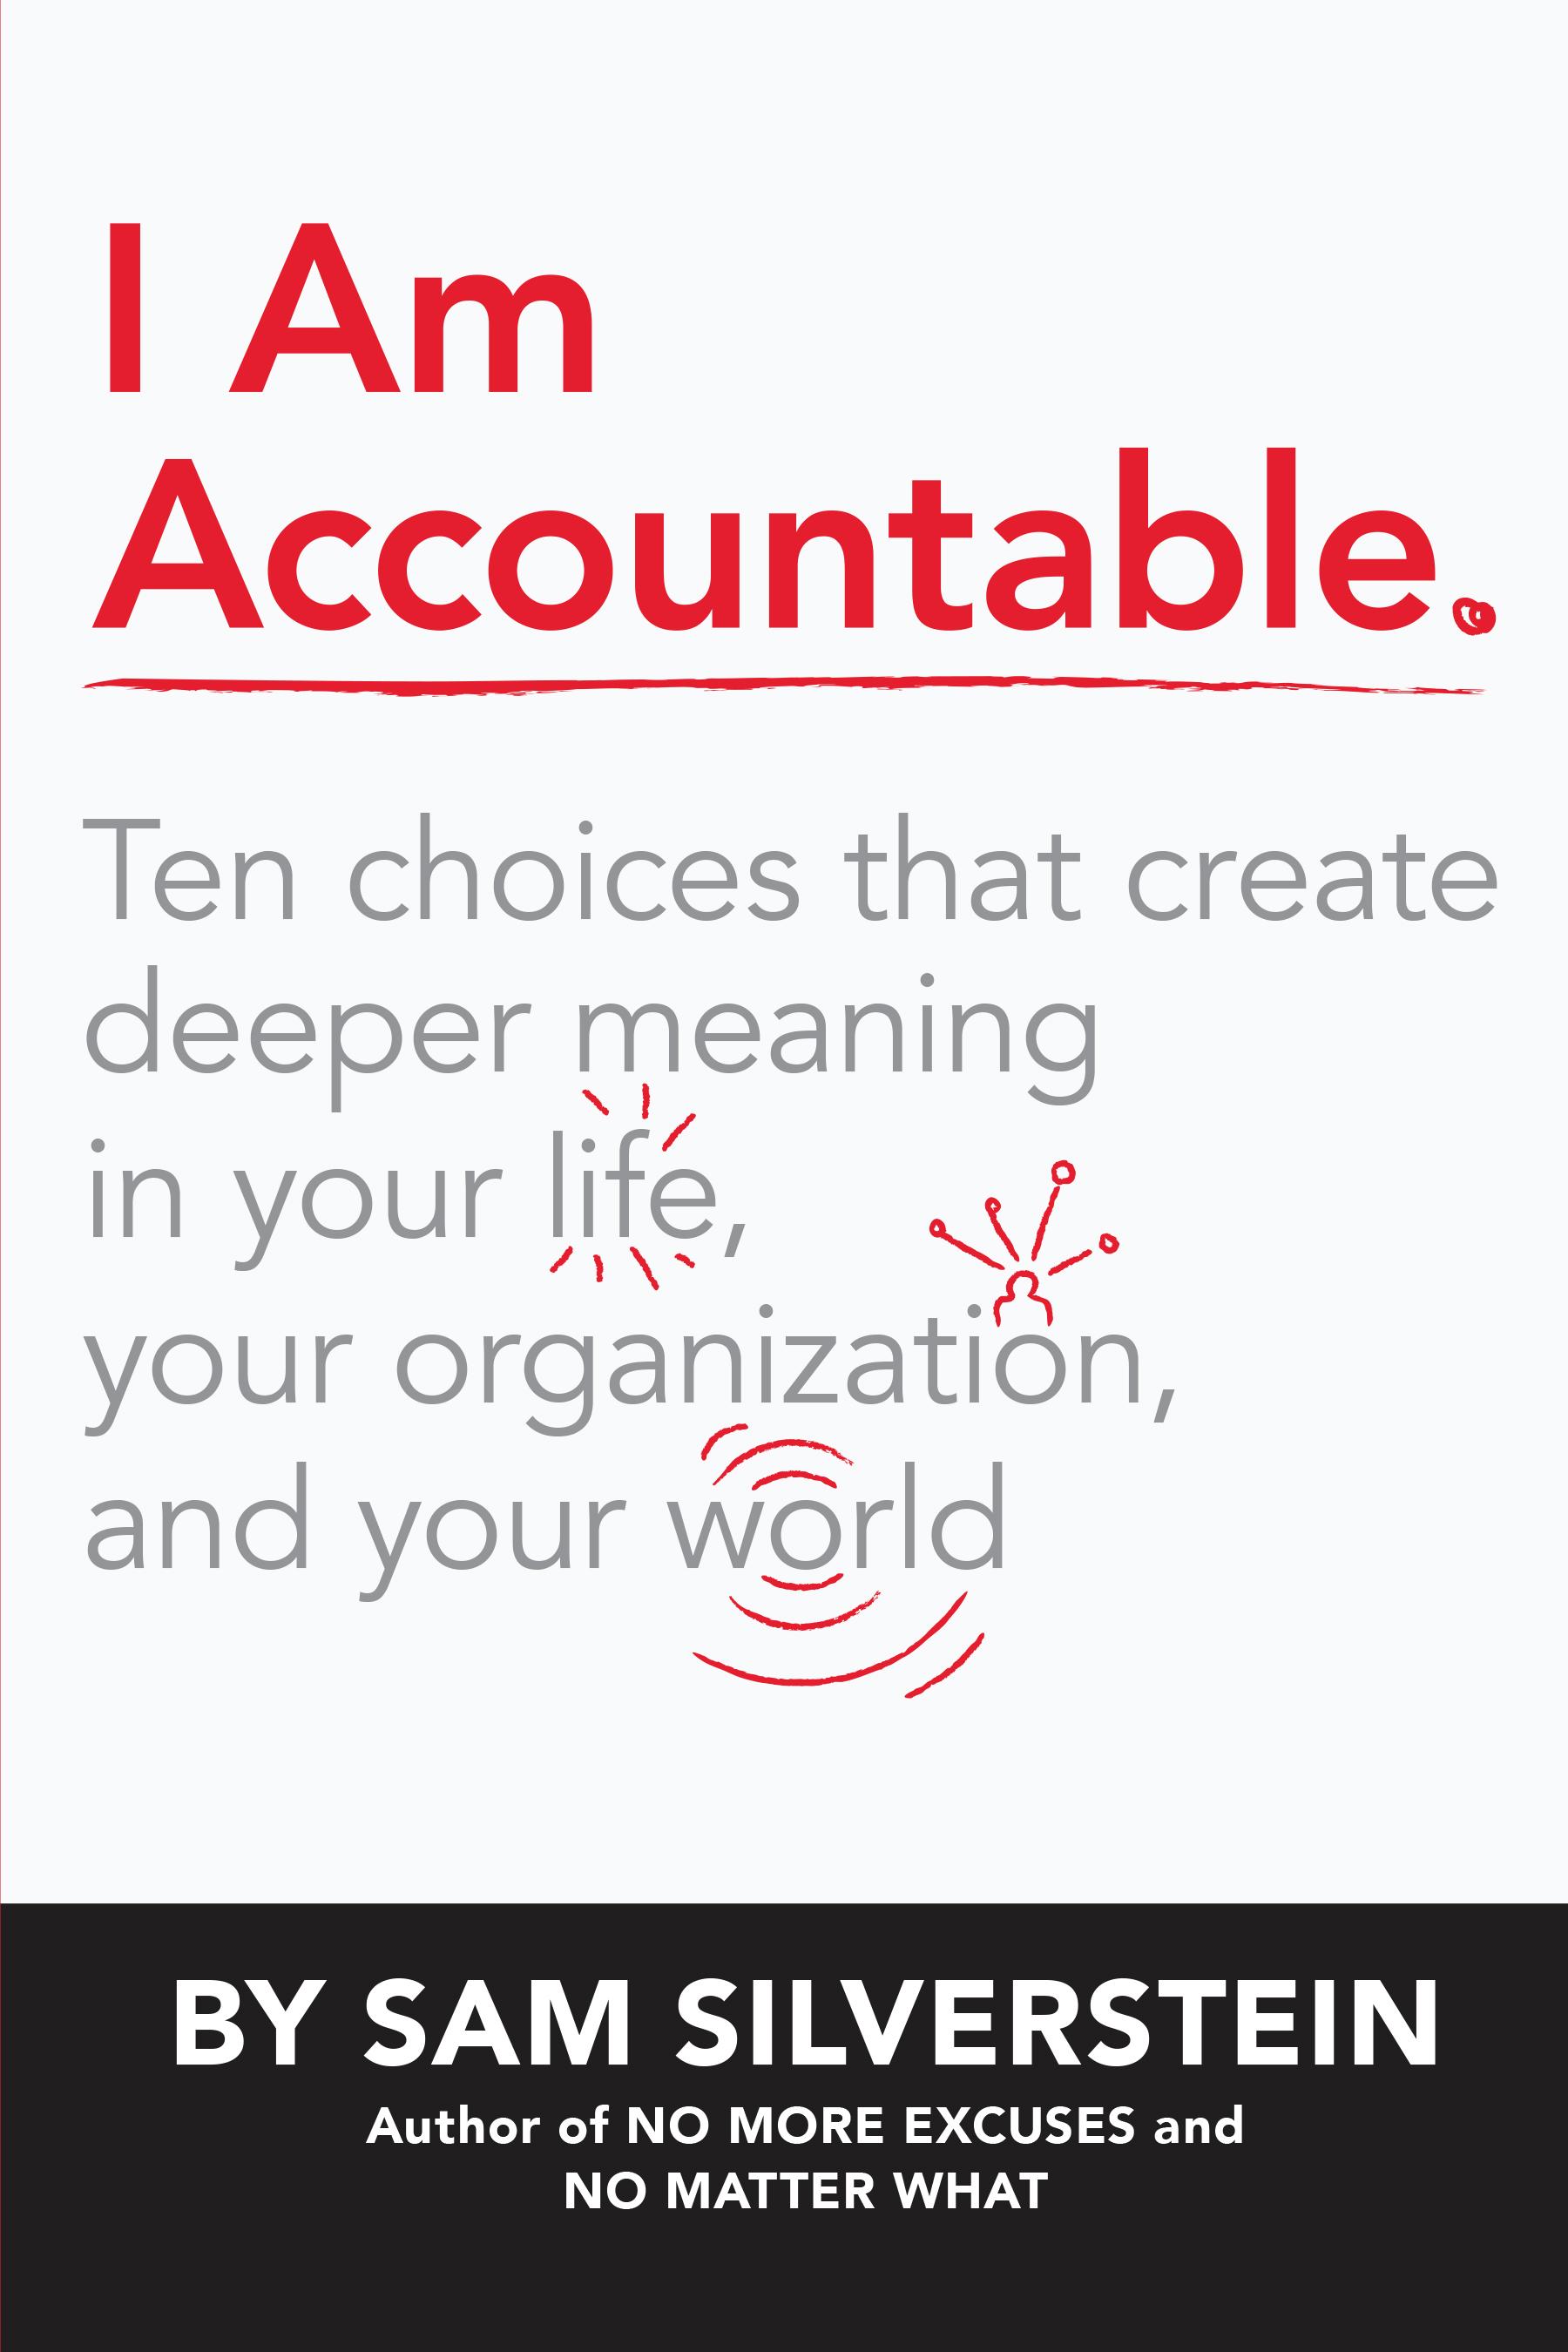 I Am Accountable - By Sam Silverstein